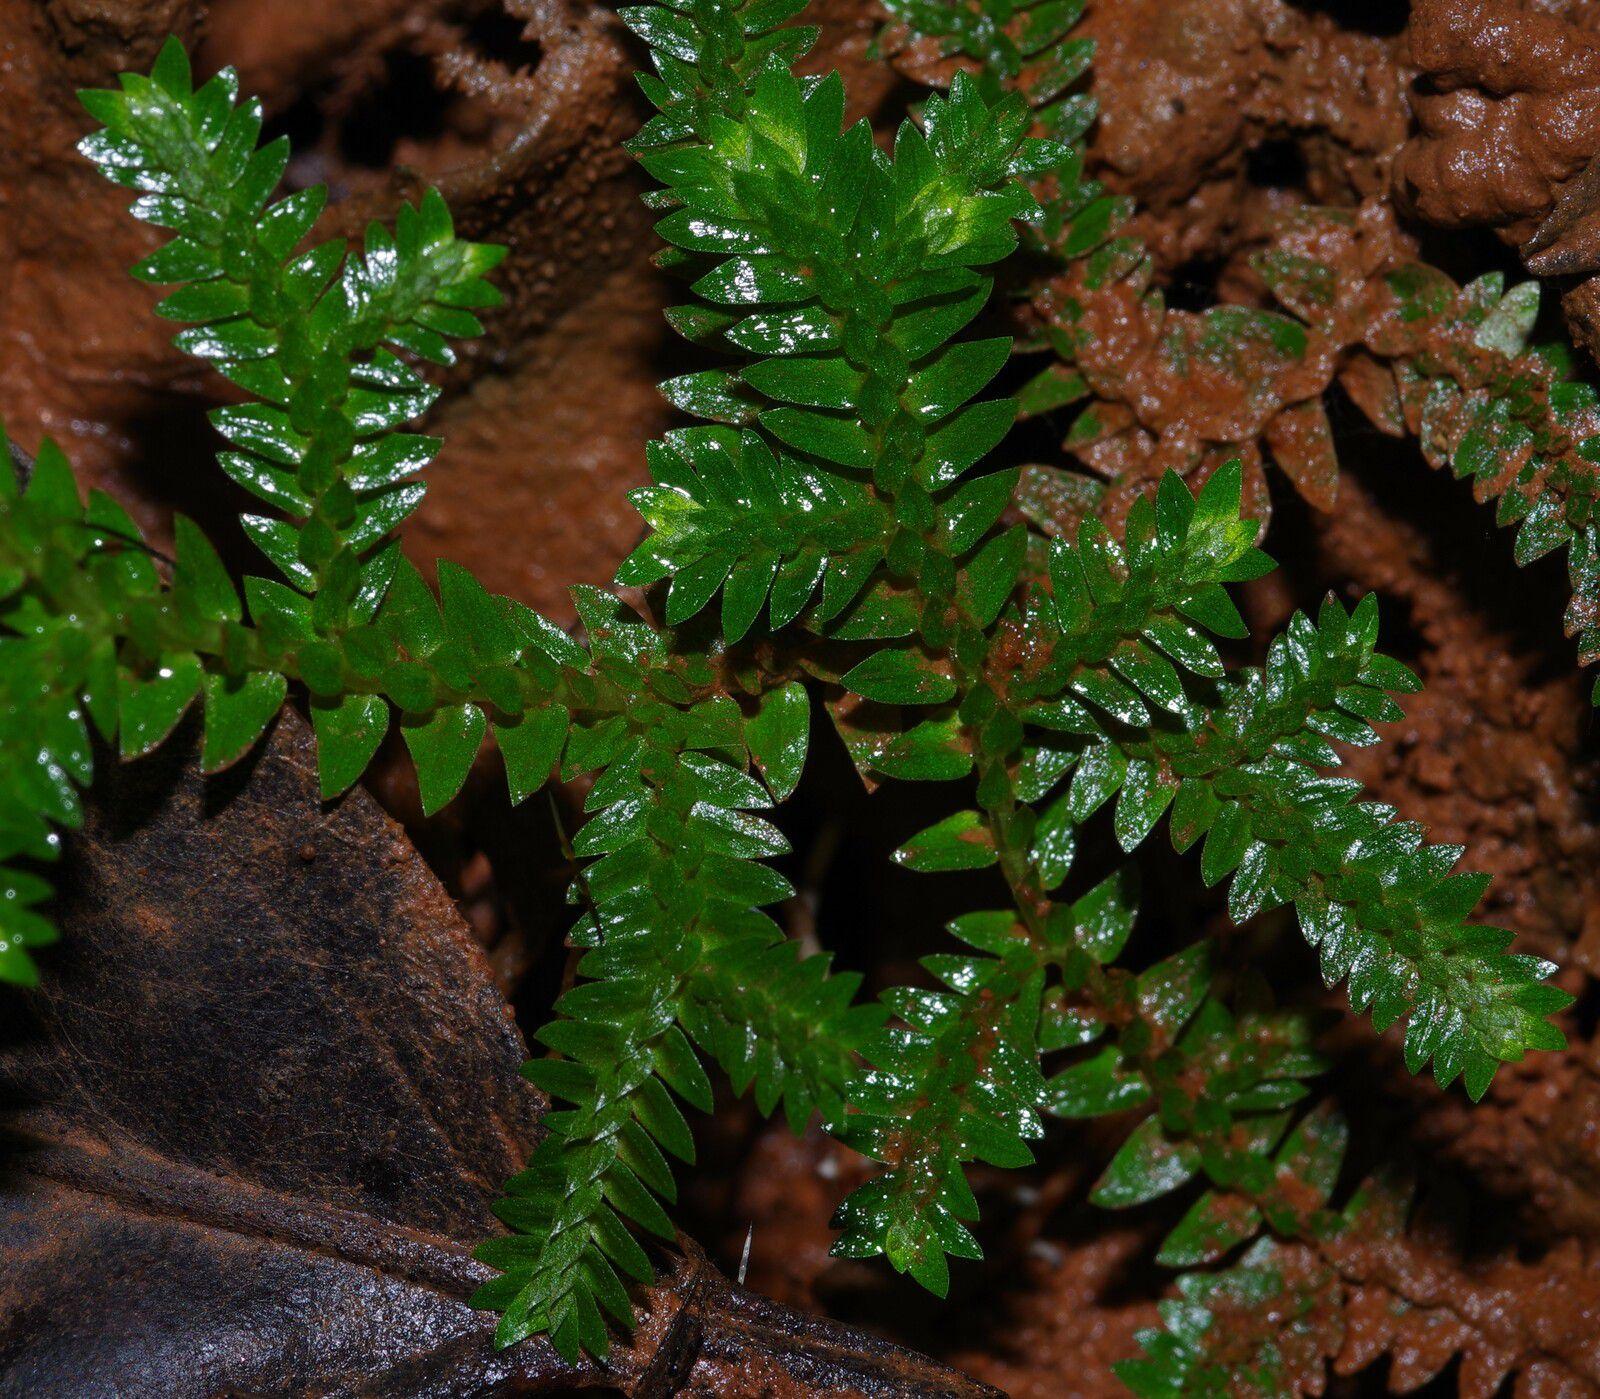 Selaginella porelloides